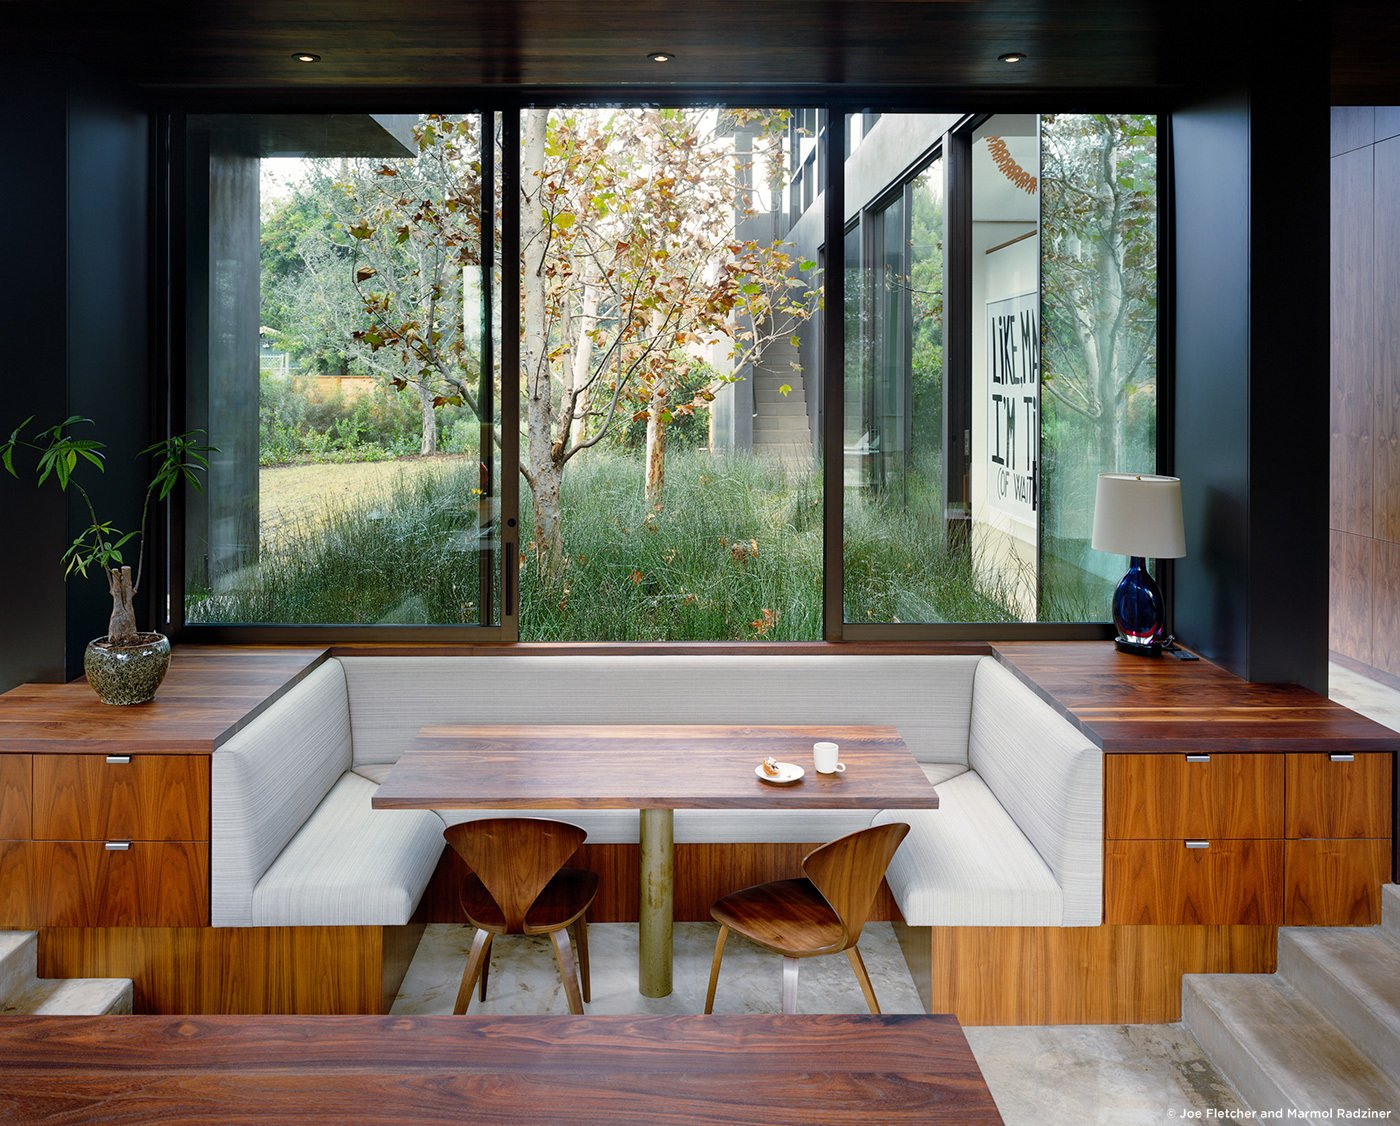 #ViennaWayResidence #modern #midcentury #inside #interior #windows #lighting #dining #wood #table #seating #booth #storage #exterior #landscape #Venice #California #MarmolRadziner  Vienna Way Residence by Marmol Radziner